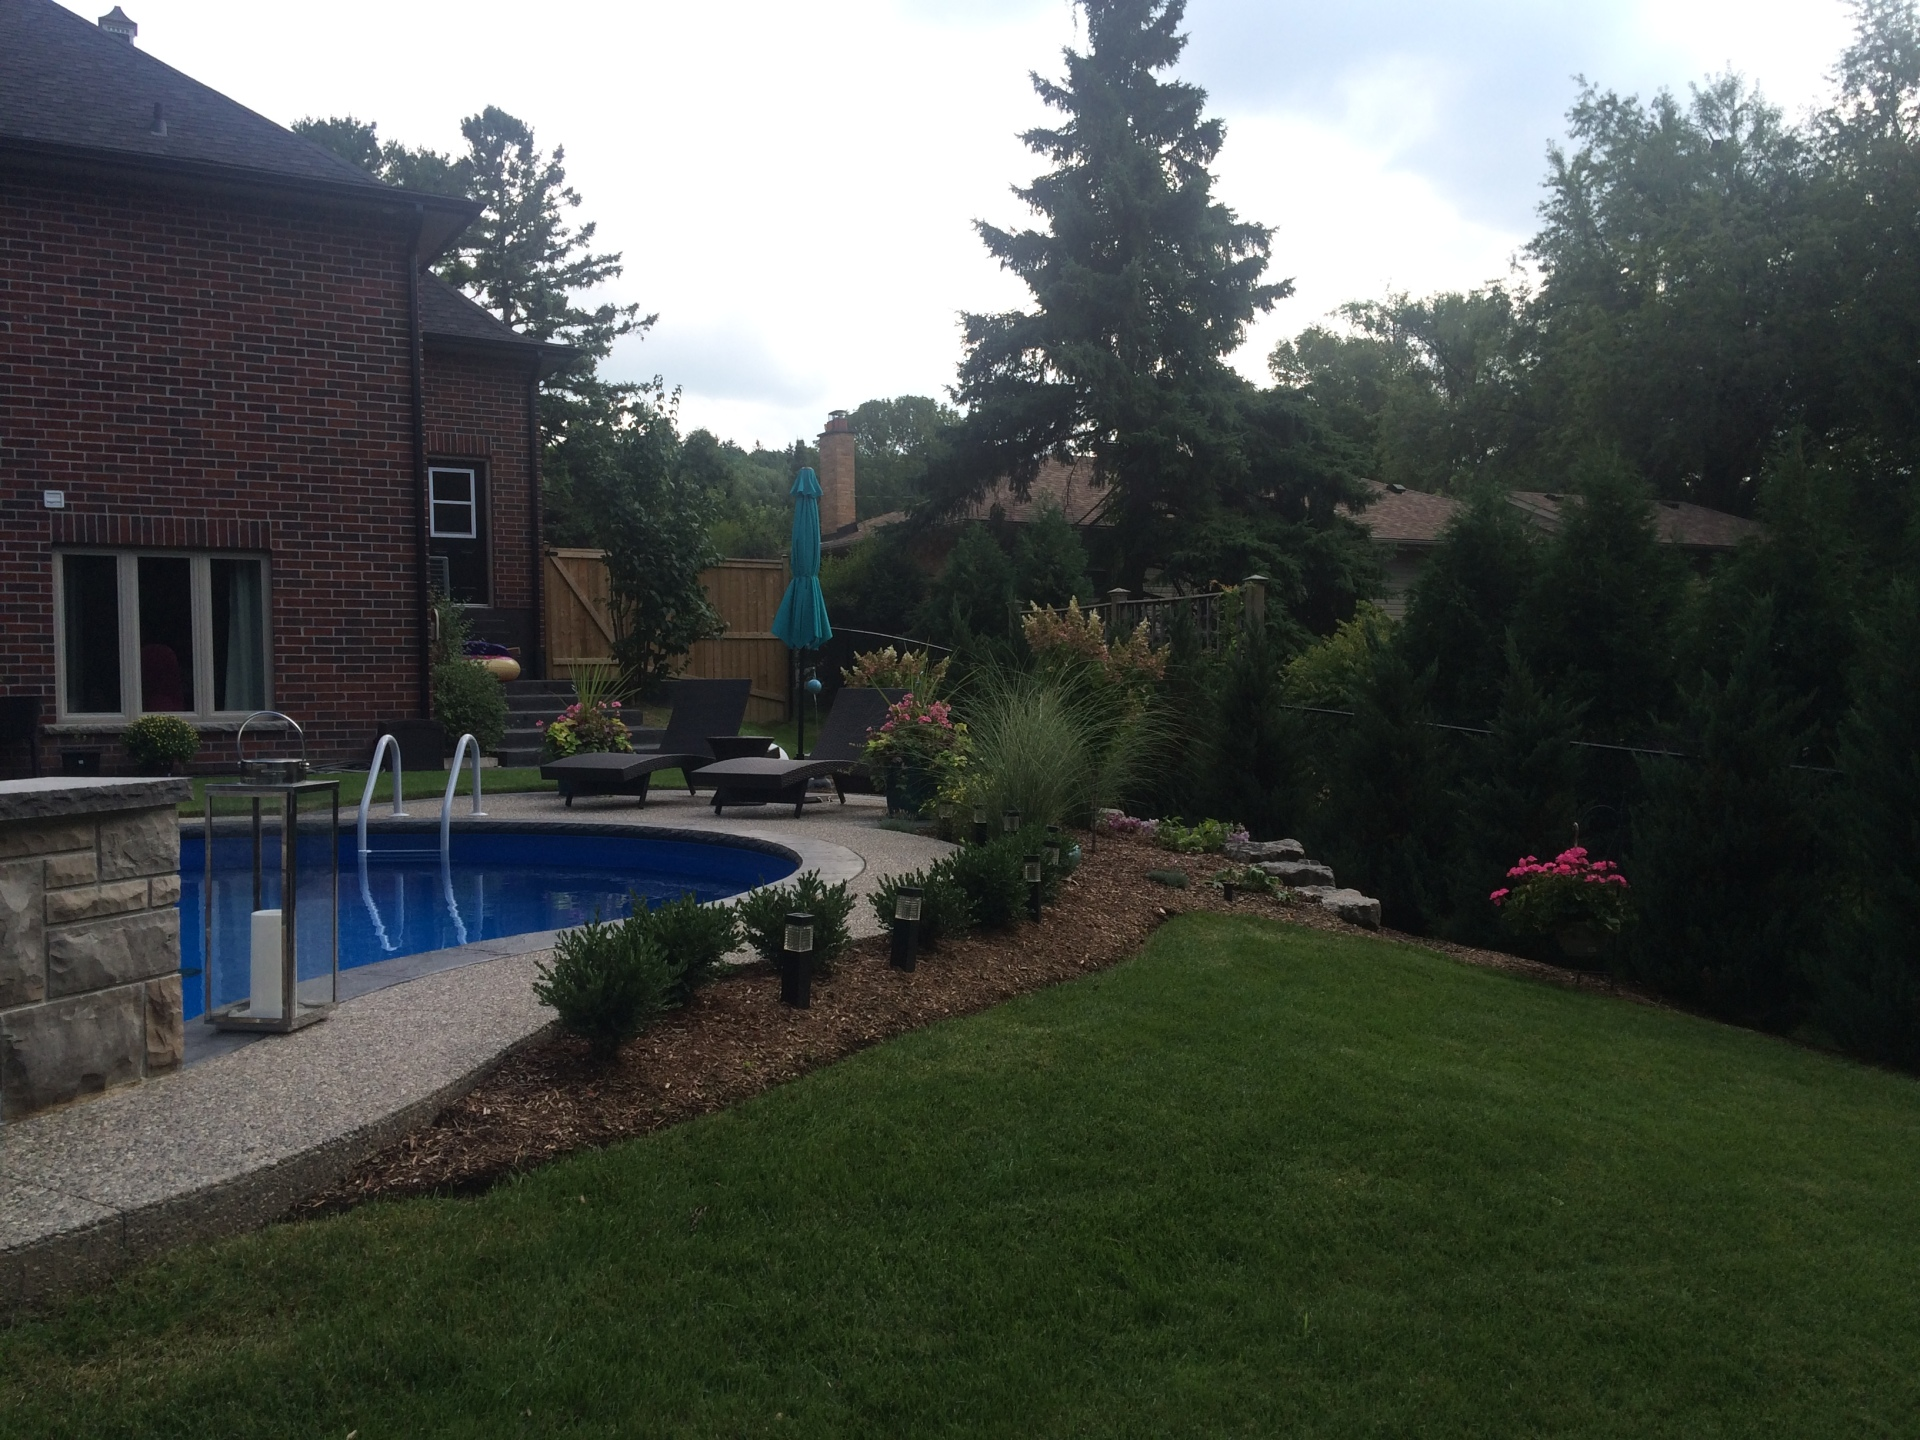 Pool Design & Install